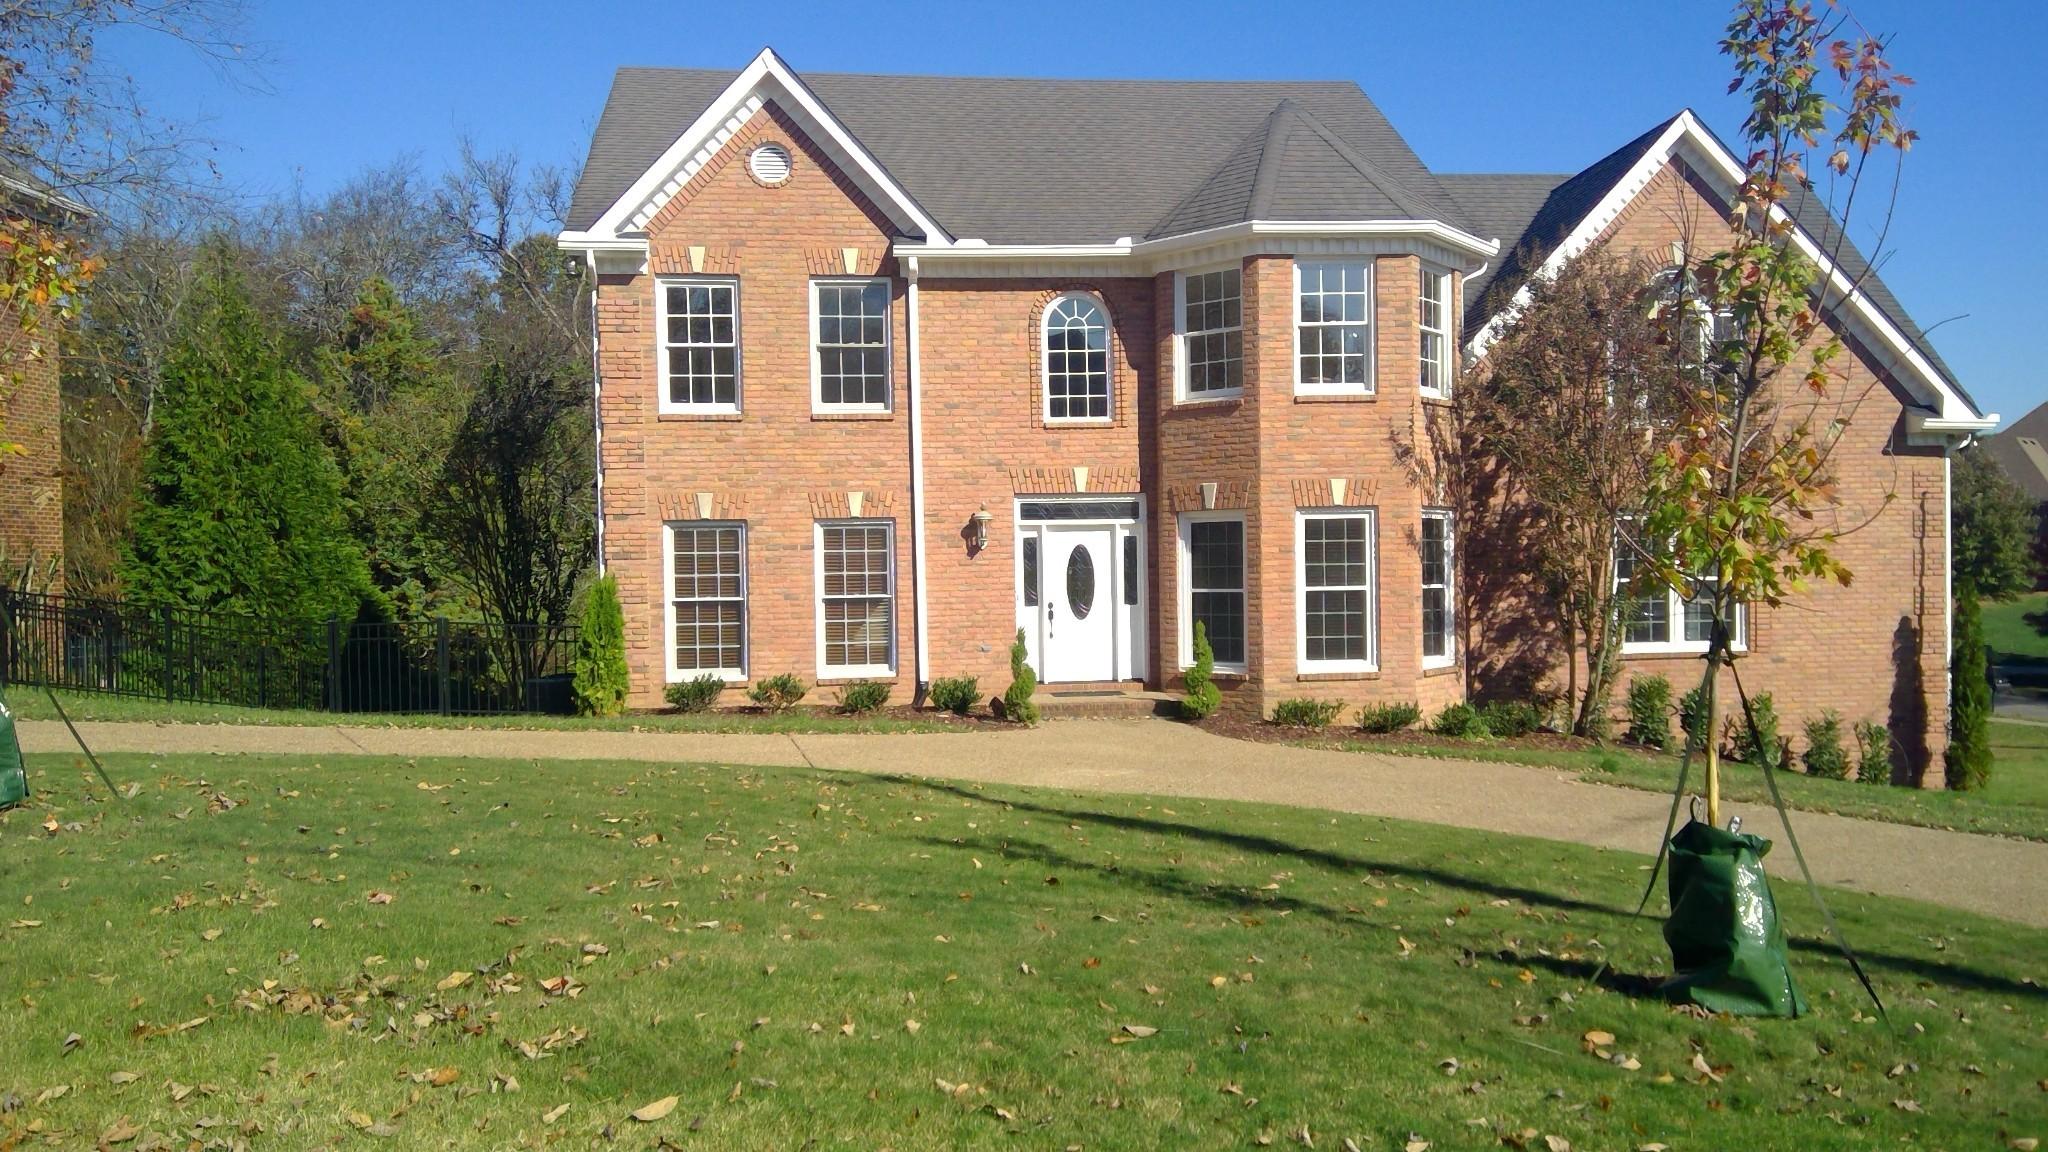 $560,000 - 6Br/4Ba -  for Sale in Glen Leven Sec 1, Hendersonville